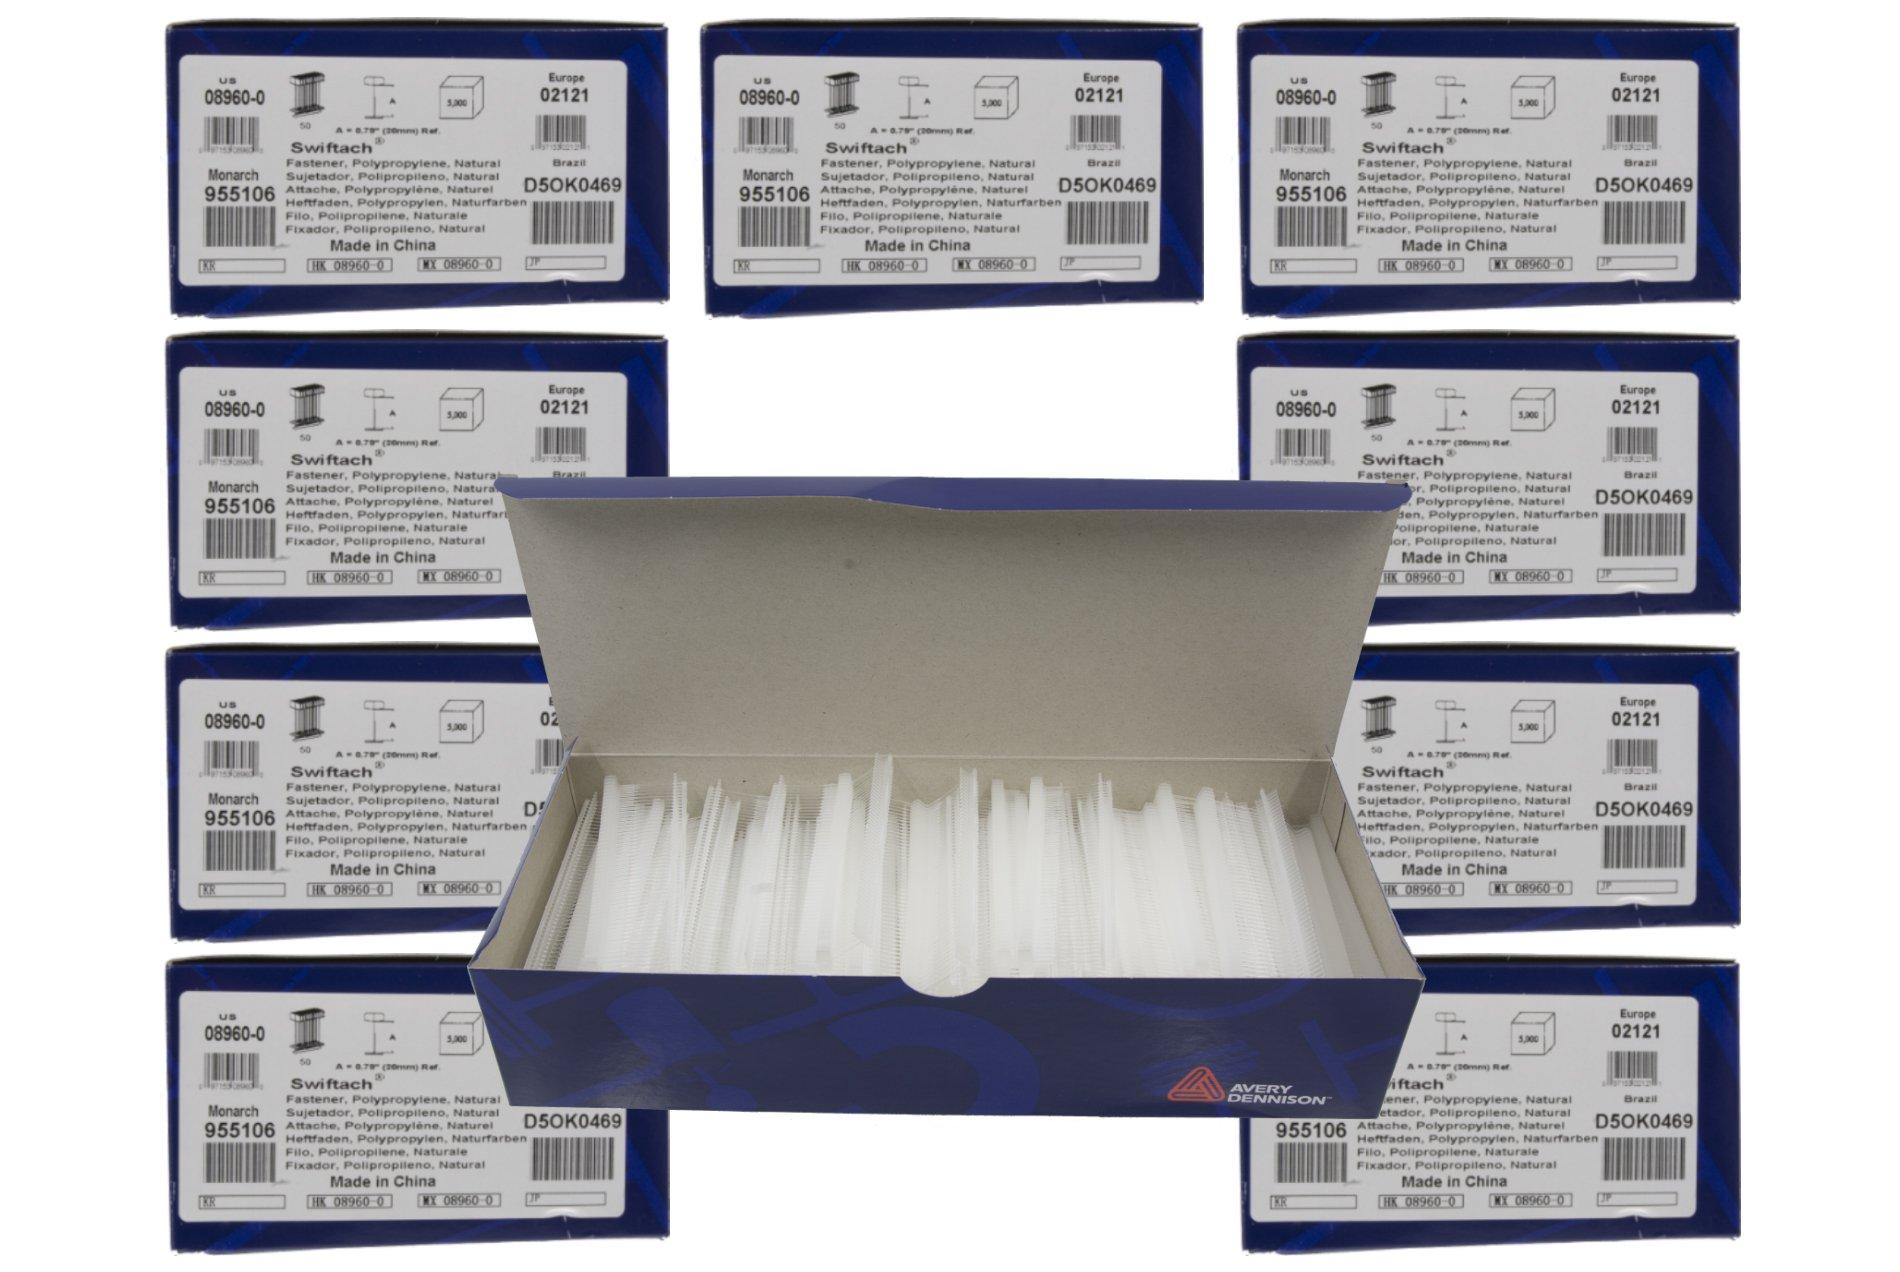 10-Pack of Avery Dennison 1'' Swiftach Tagging Gun Barbs / Fasteners - 5,000 Fasteners Per Box = 50,000 Fasteners - Genuine Avery Dennison # 08960